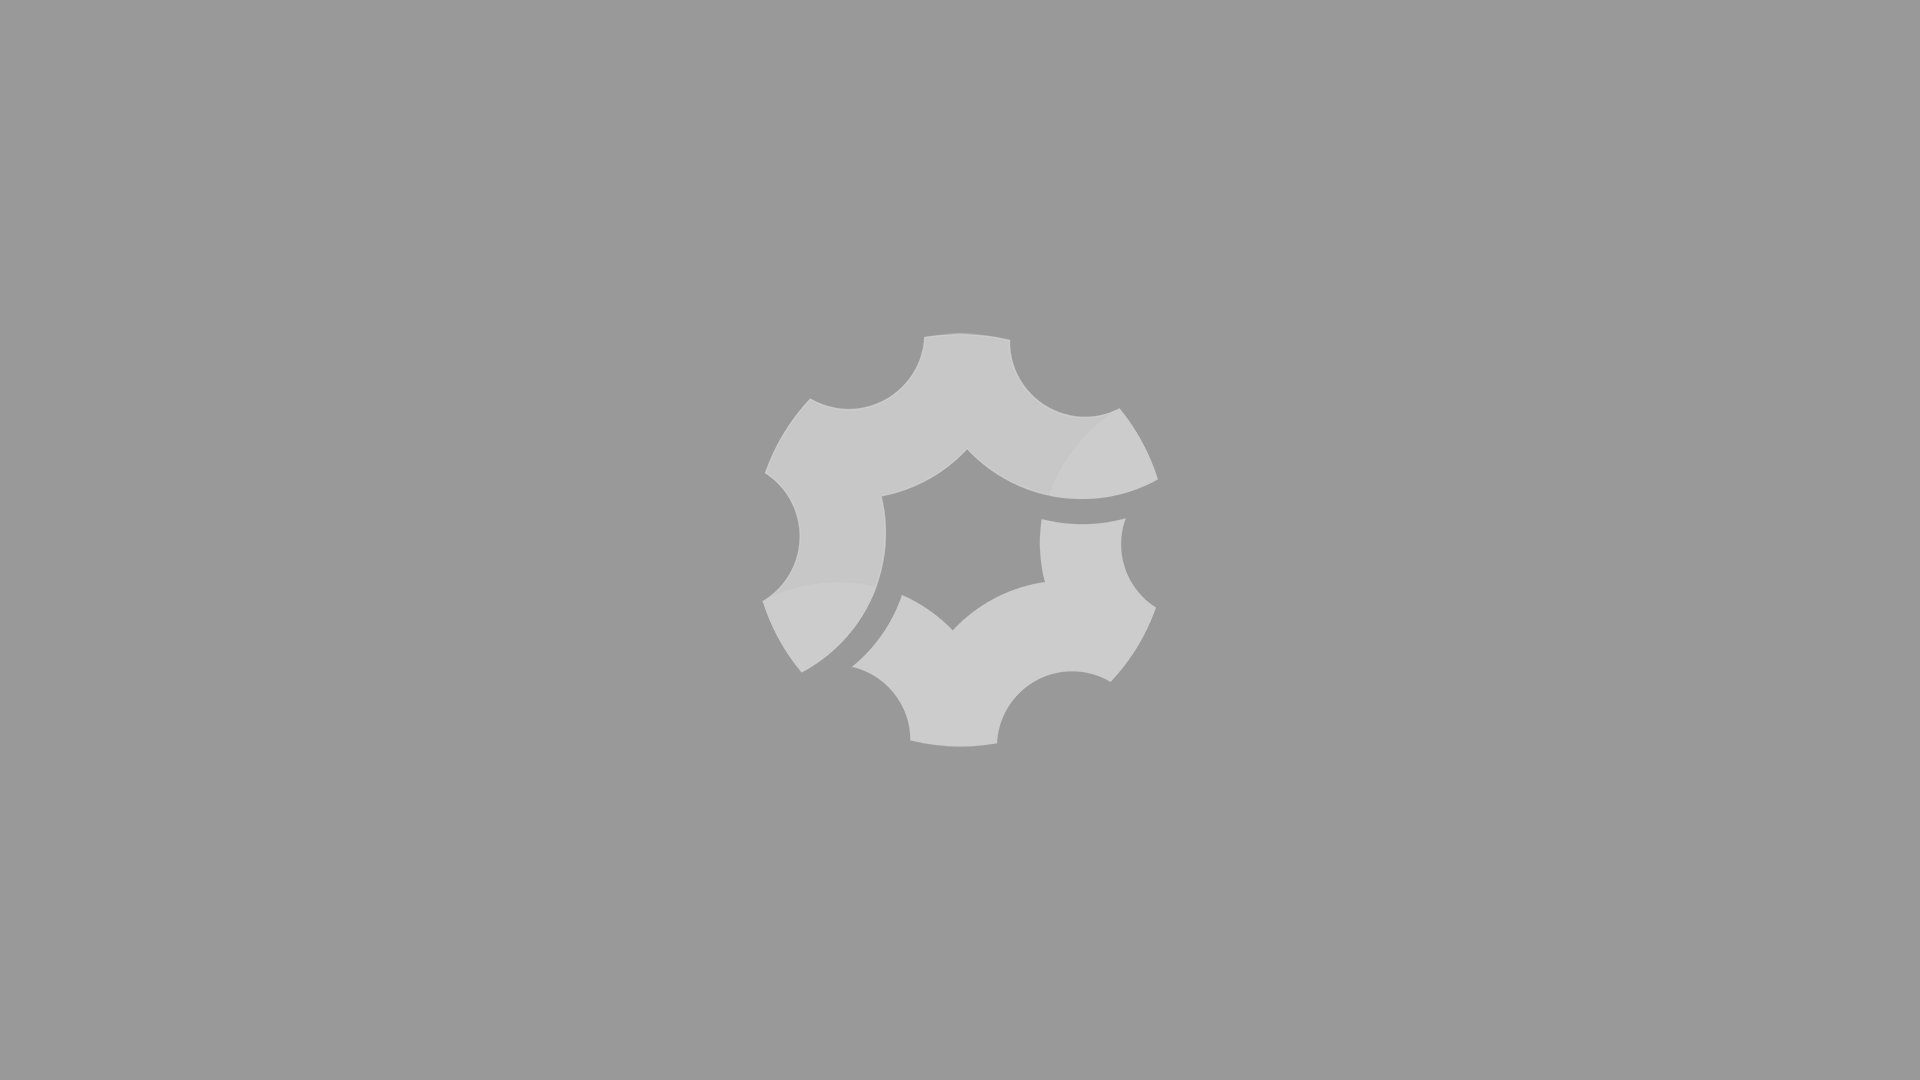 new_bitmap_image.bmp_thumbdd.png